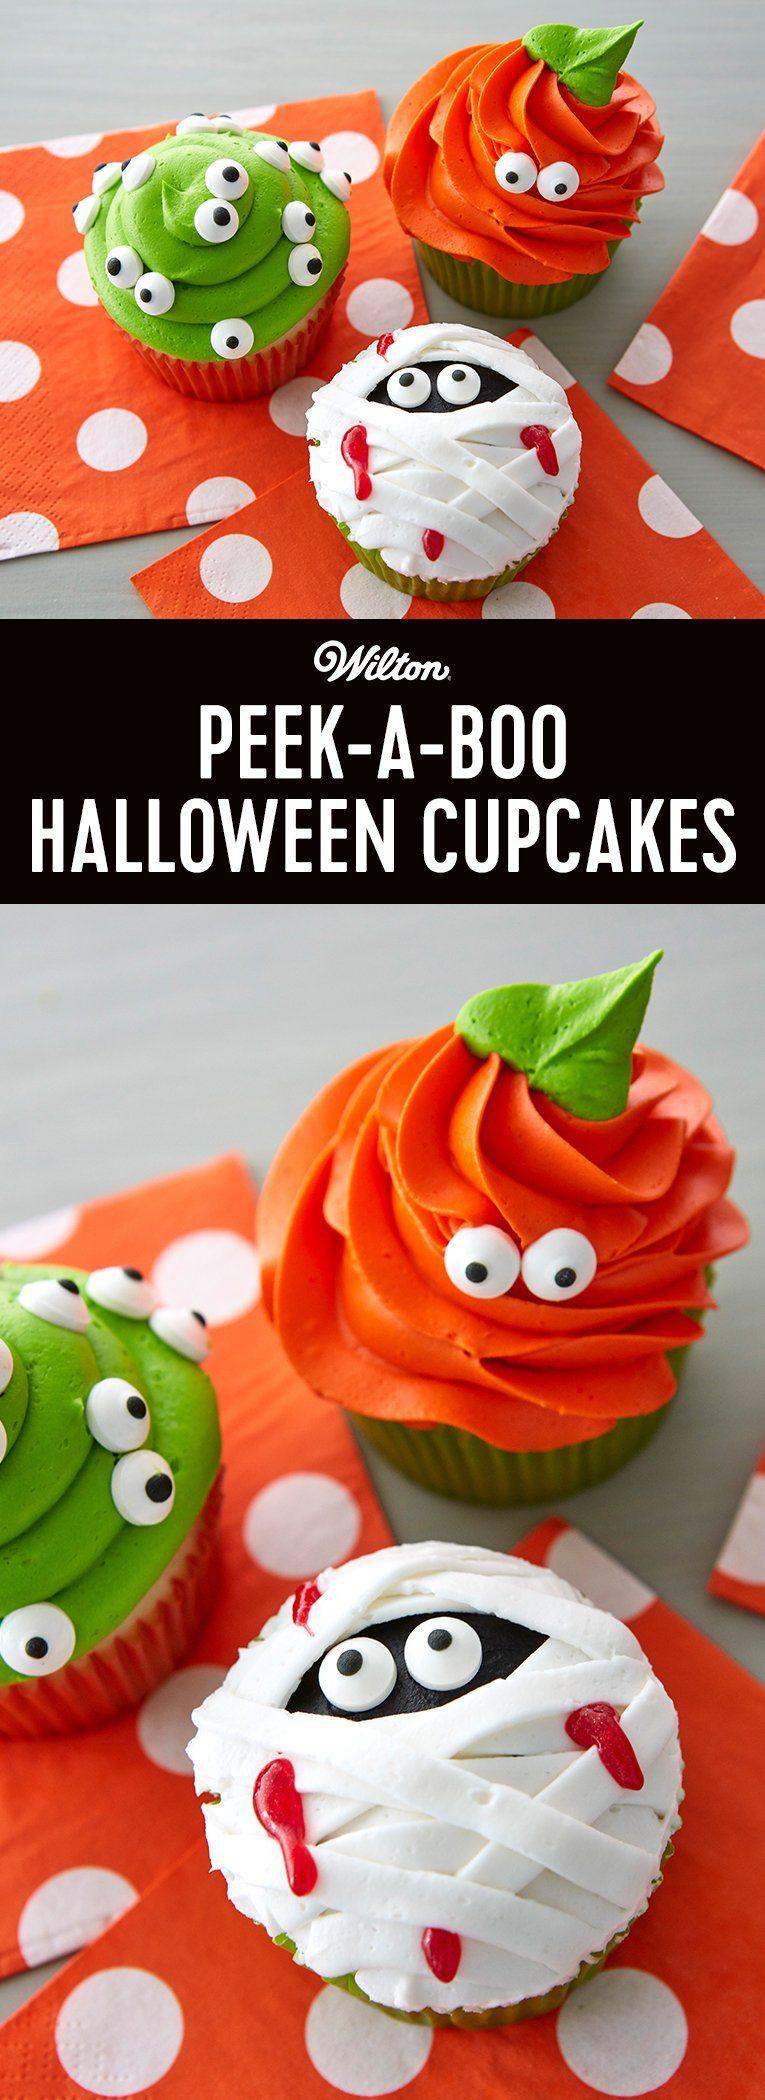 Cute Halloween Mini Cupcakes.Cute Halloween Monster Cupcakes Recipe Halloween Cupcakes Monster Cupcakes Halloween Cakes